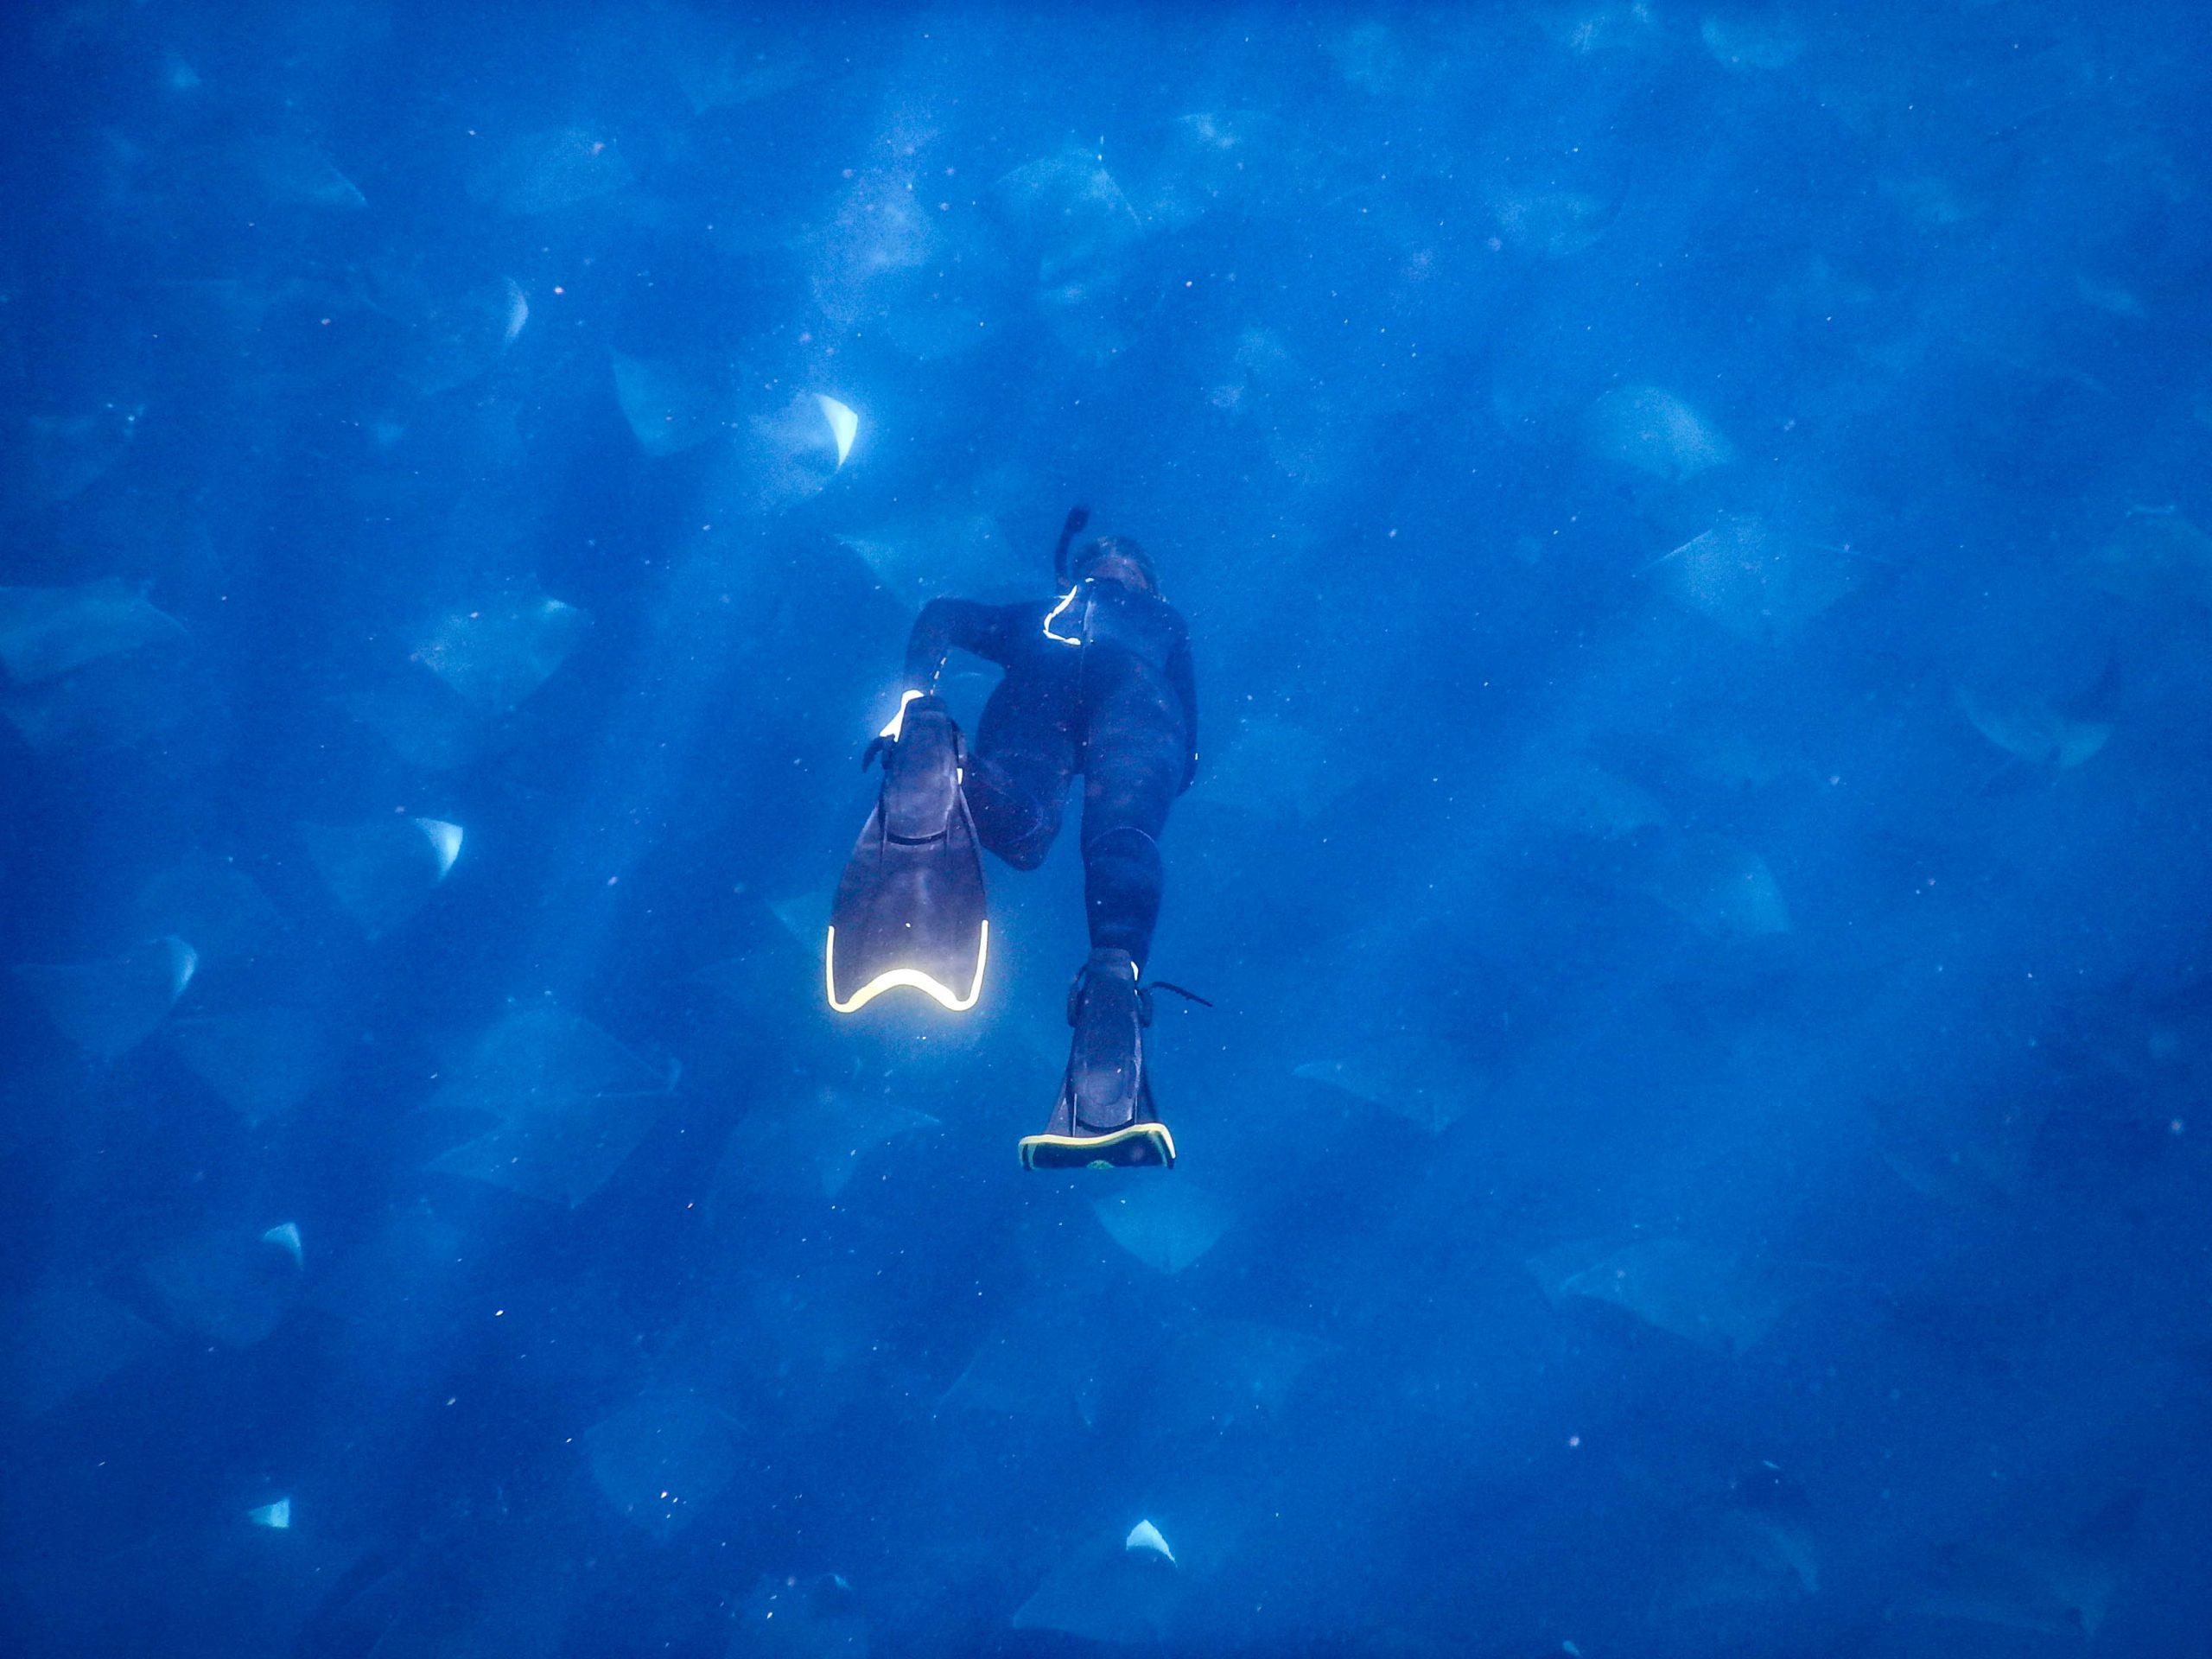 Into the blue mobula migration